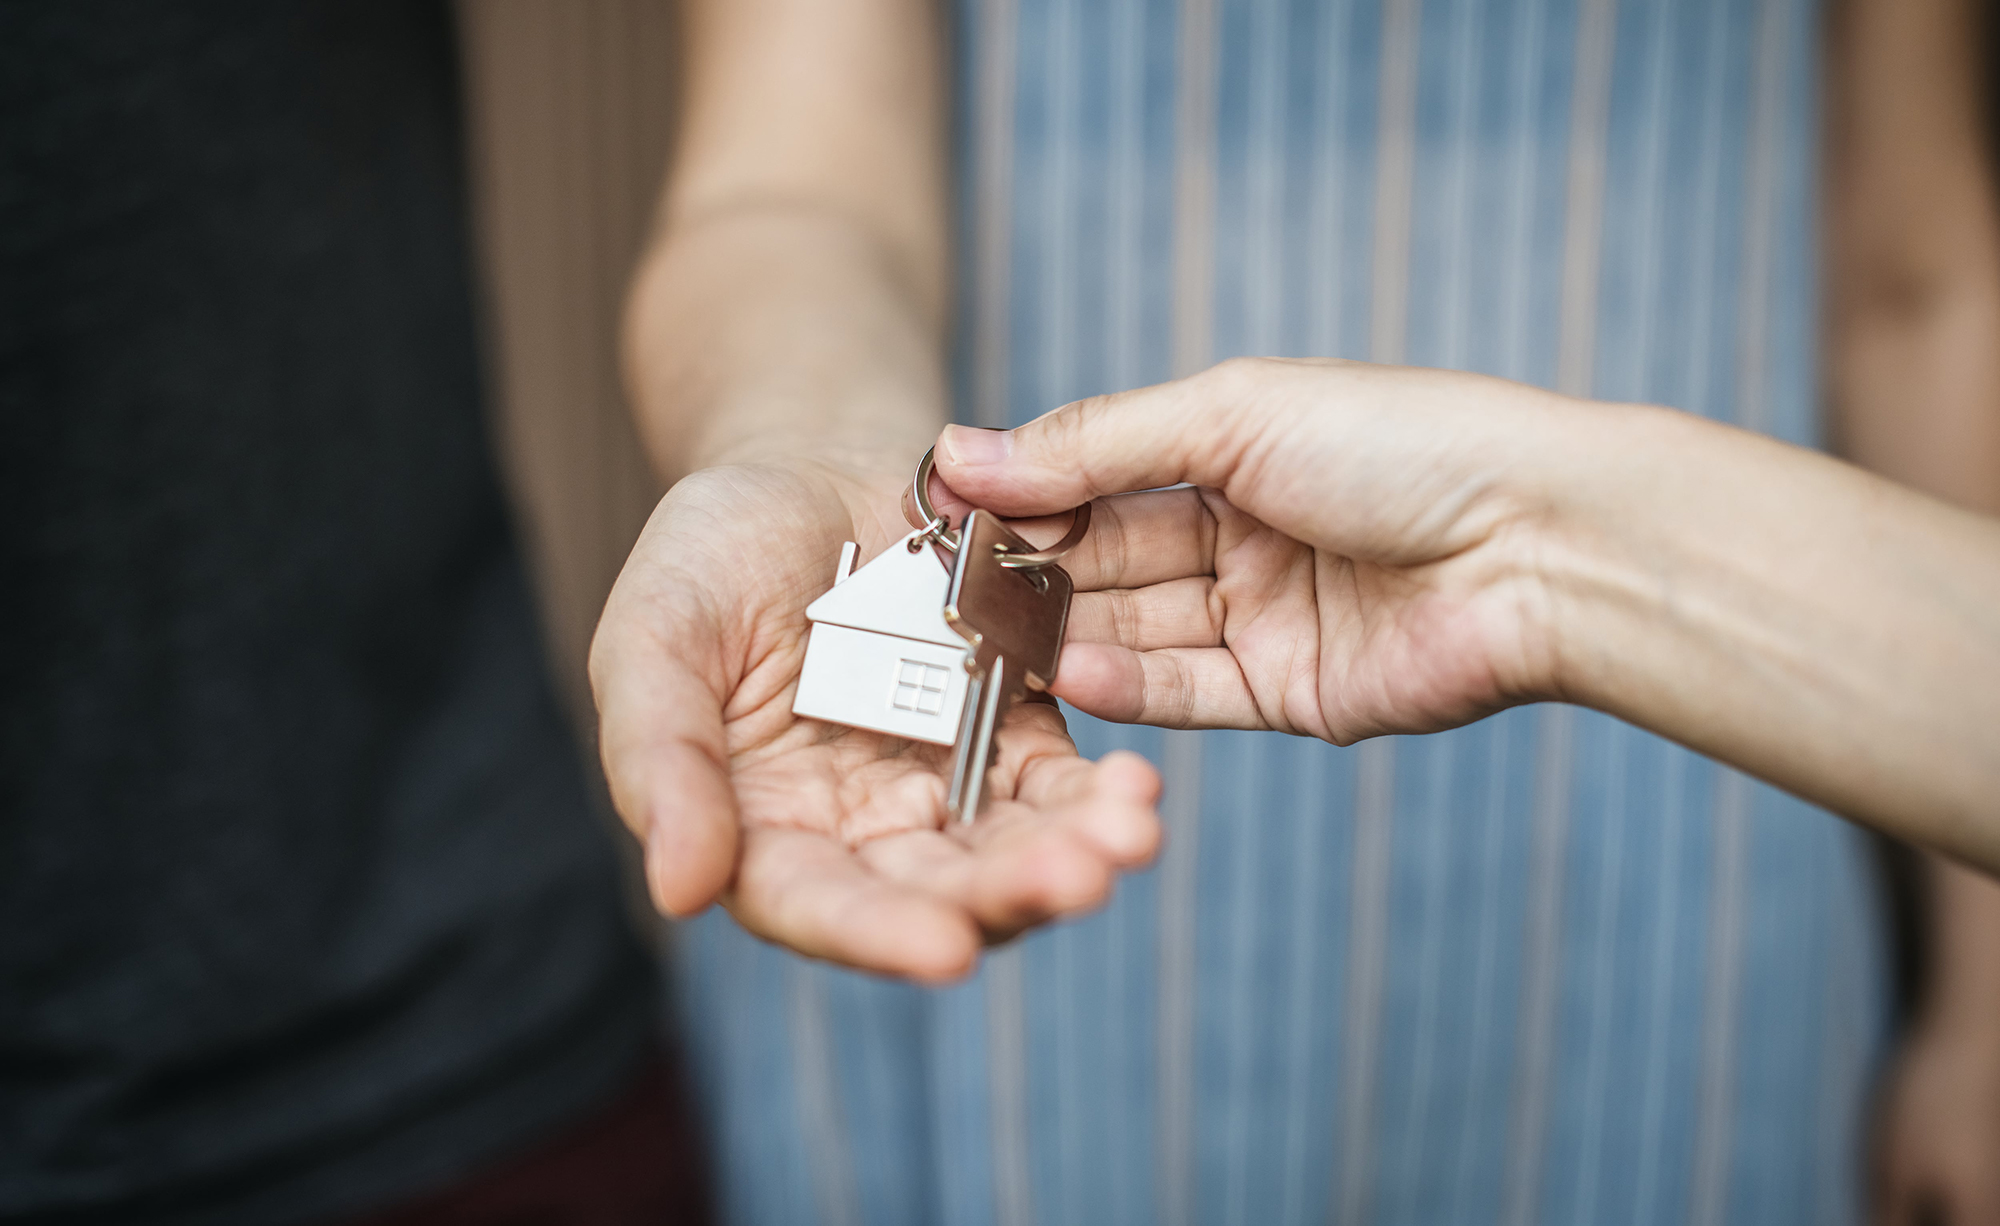 woman-buying-a-new-house-B2T5G9U-min.jpg